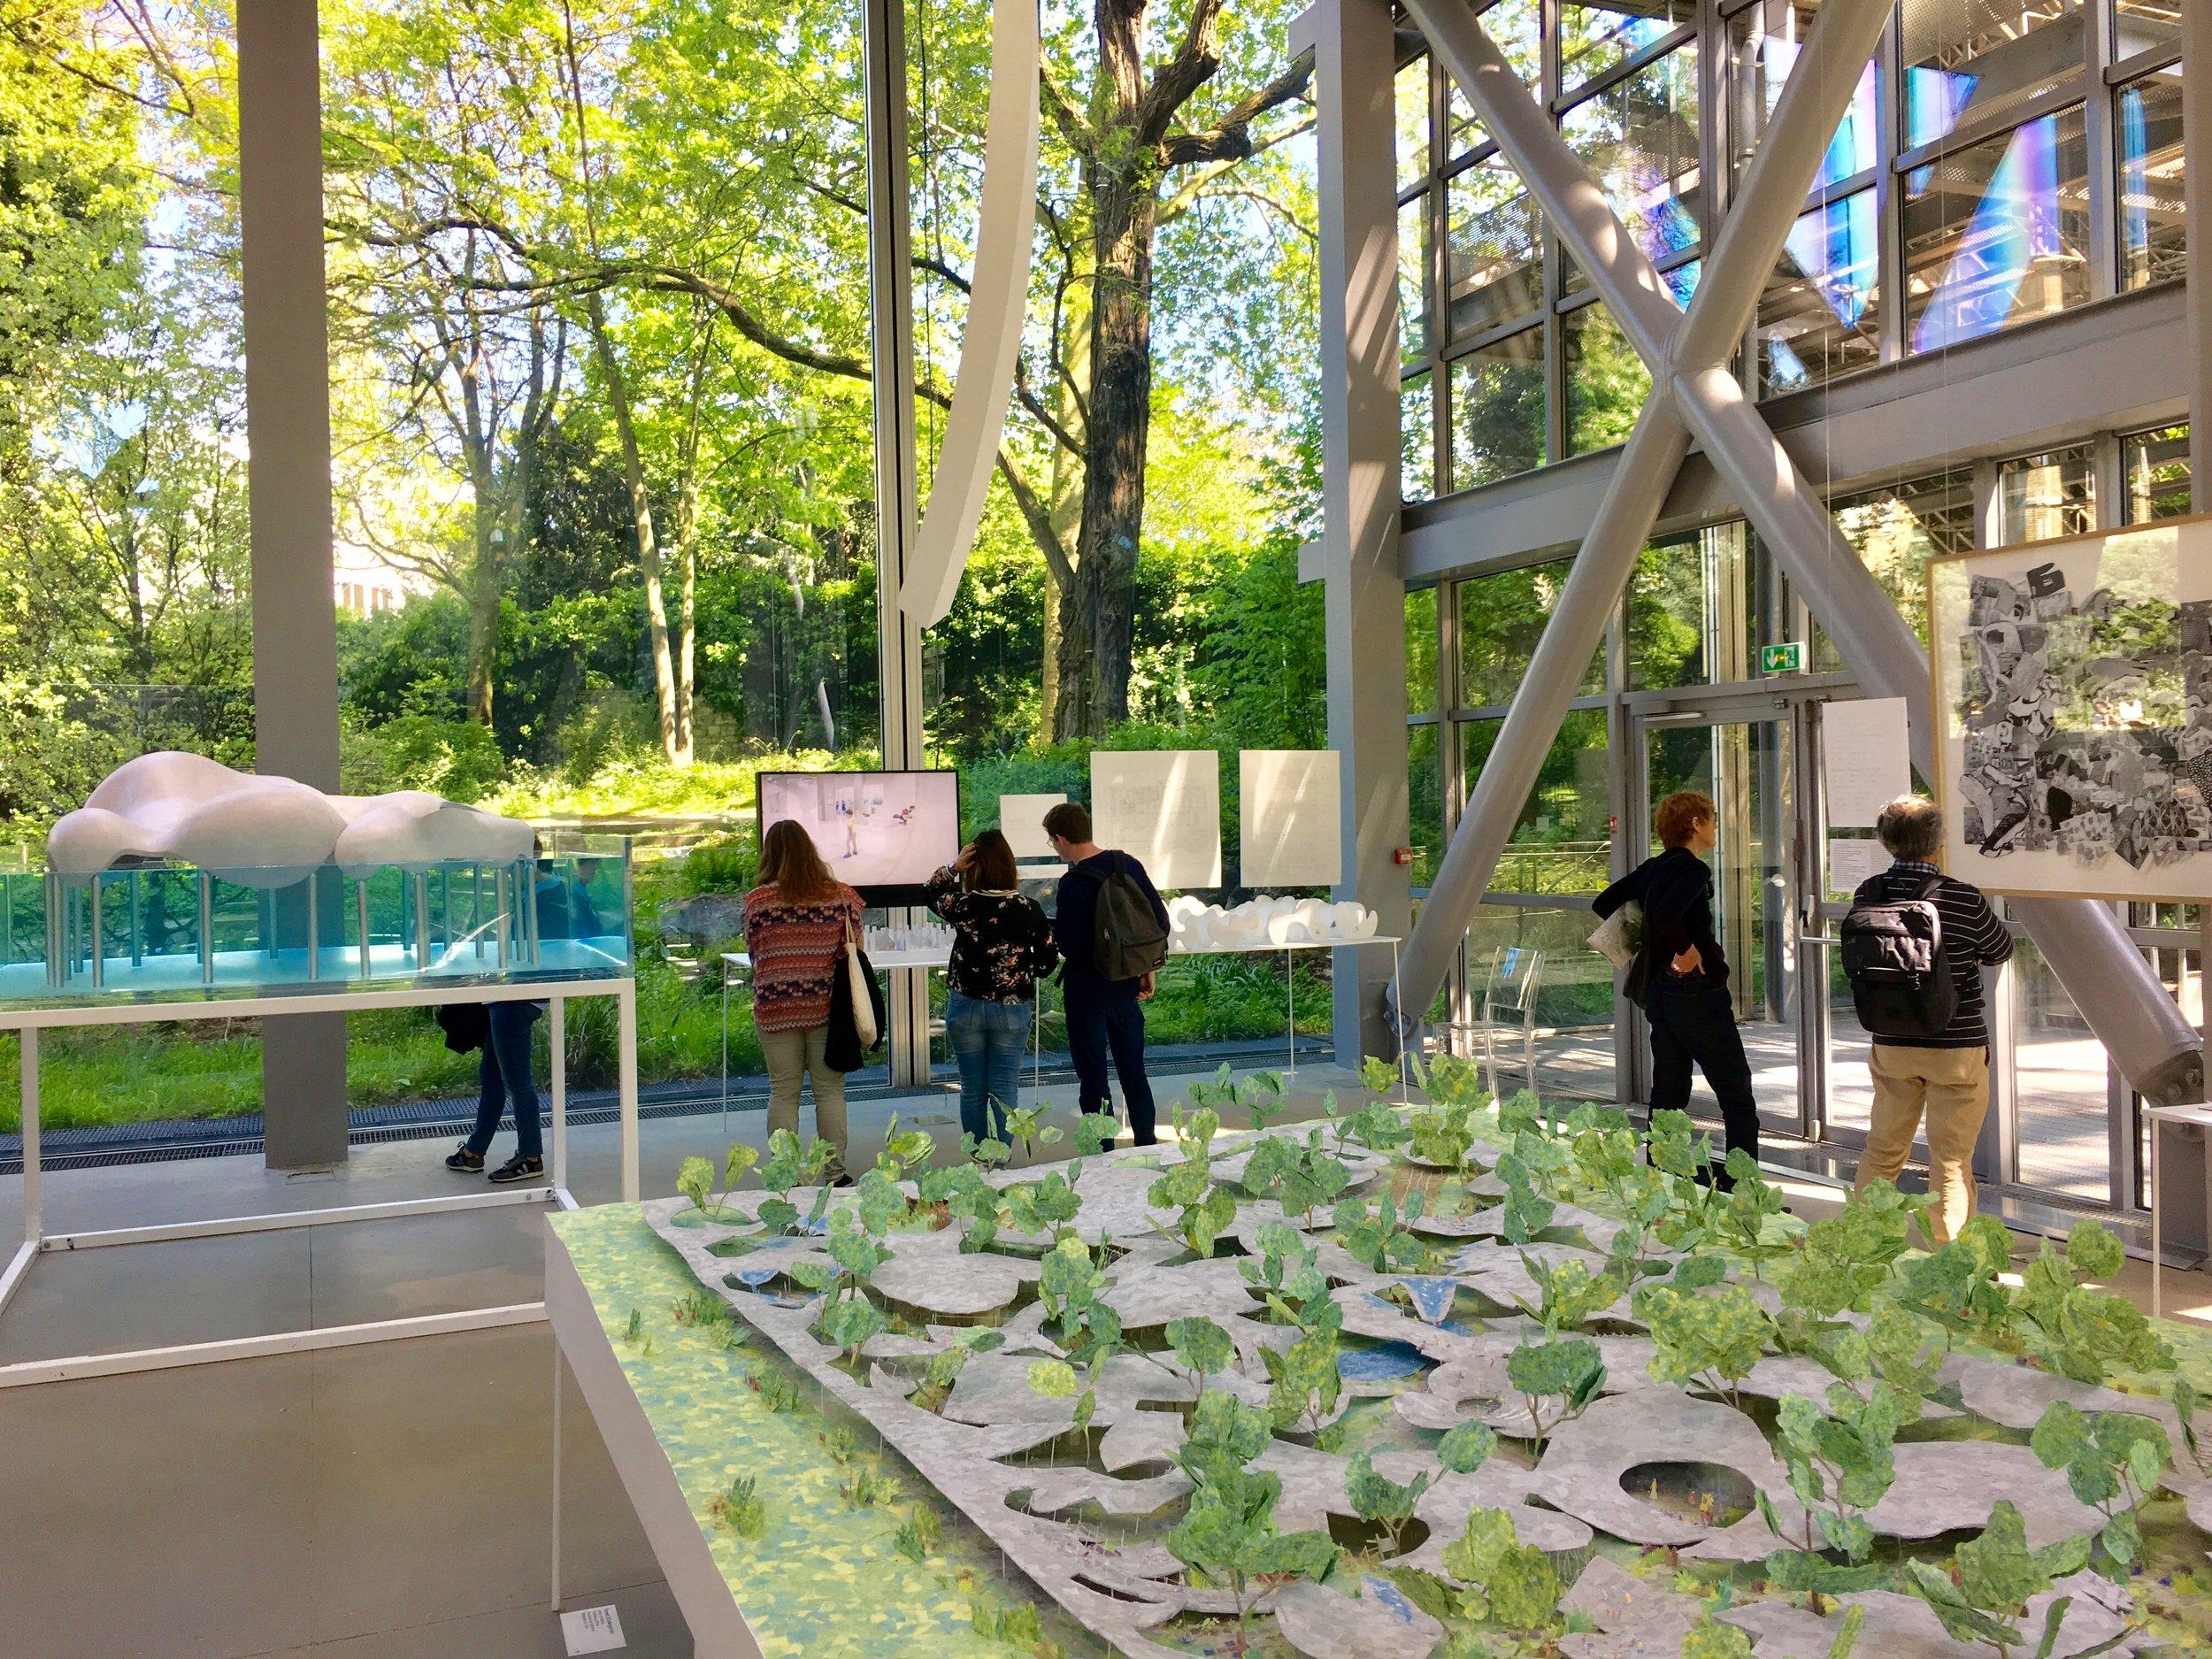 Vue de l'exposition Junya Ishigami Fondation Cartier Photo Mouche Cousue